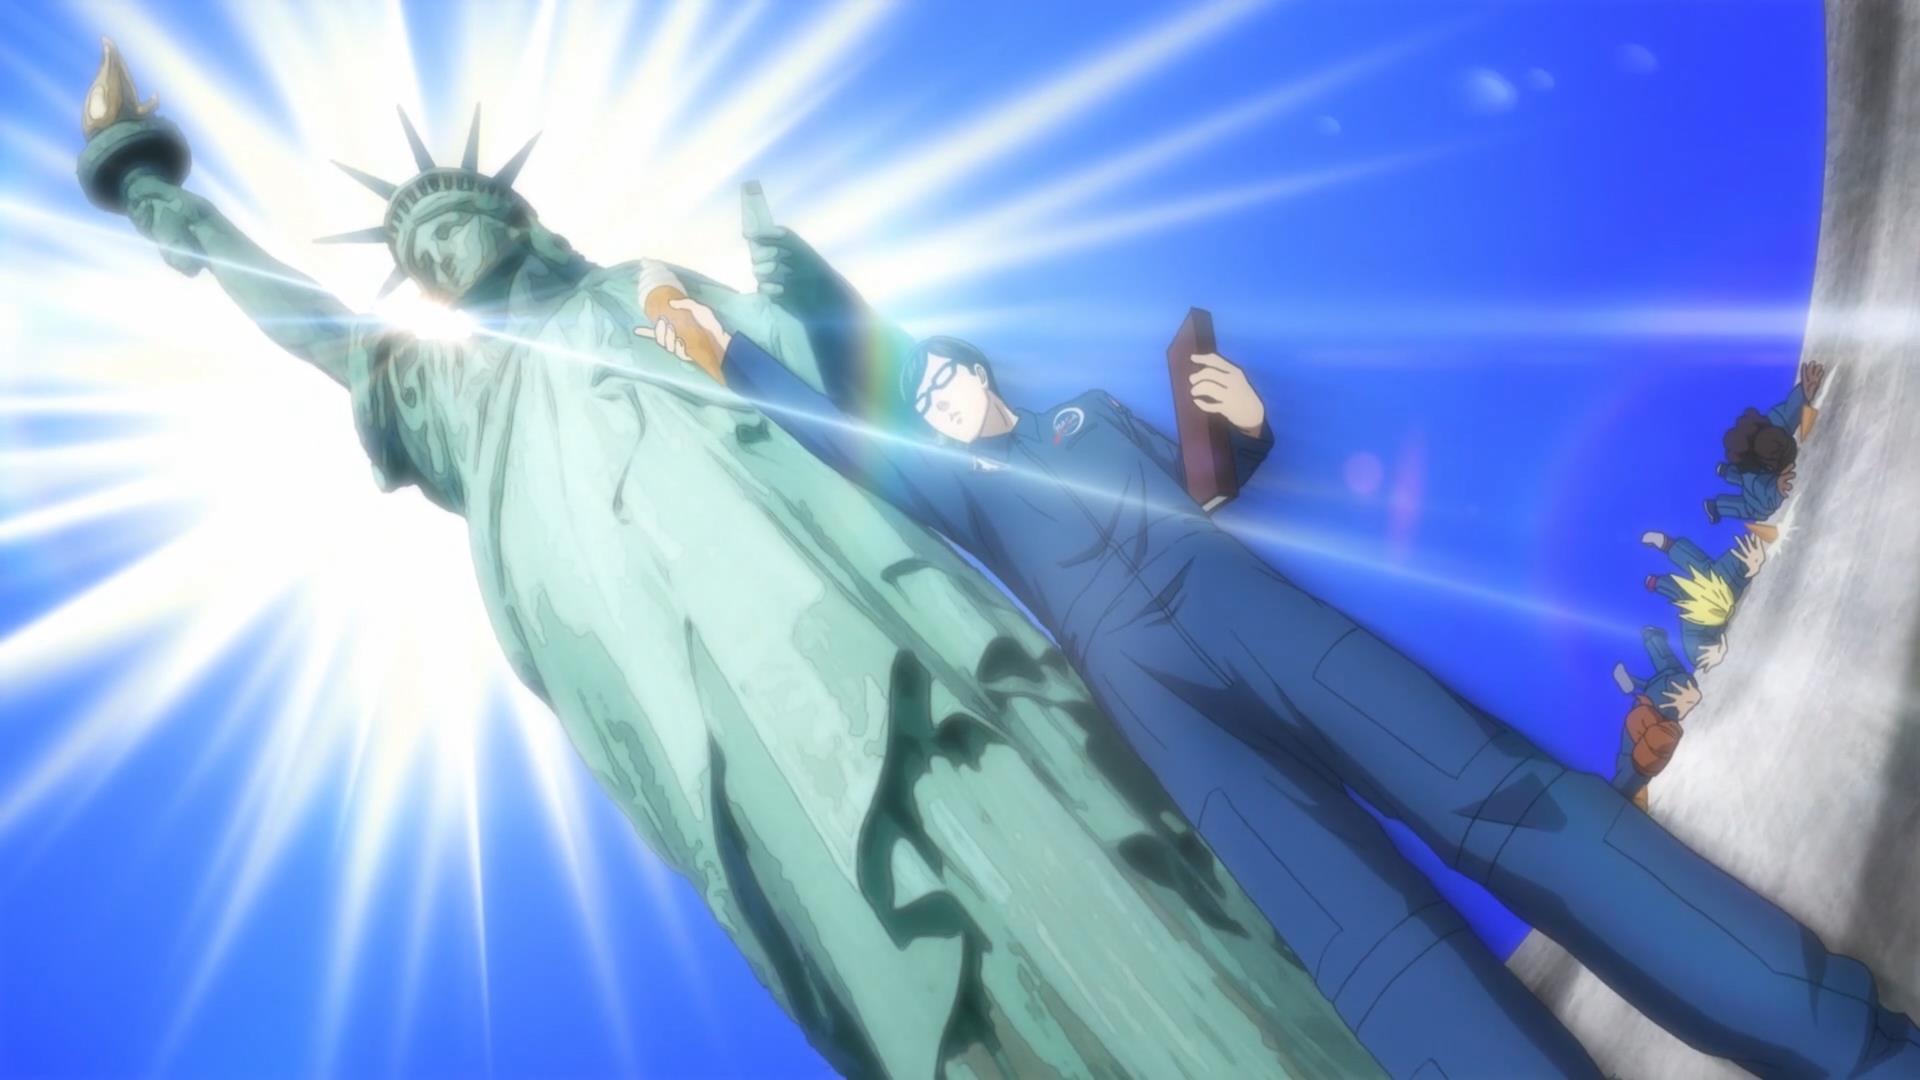 [2.0] Caméos et clins d'oeil dans les anime et mangas!  - Page 9 679334HorribleSubsSakamotodesuga131080pmkvsnapshot145320160927140712